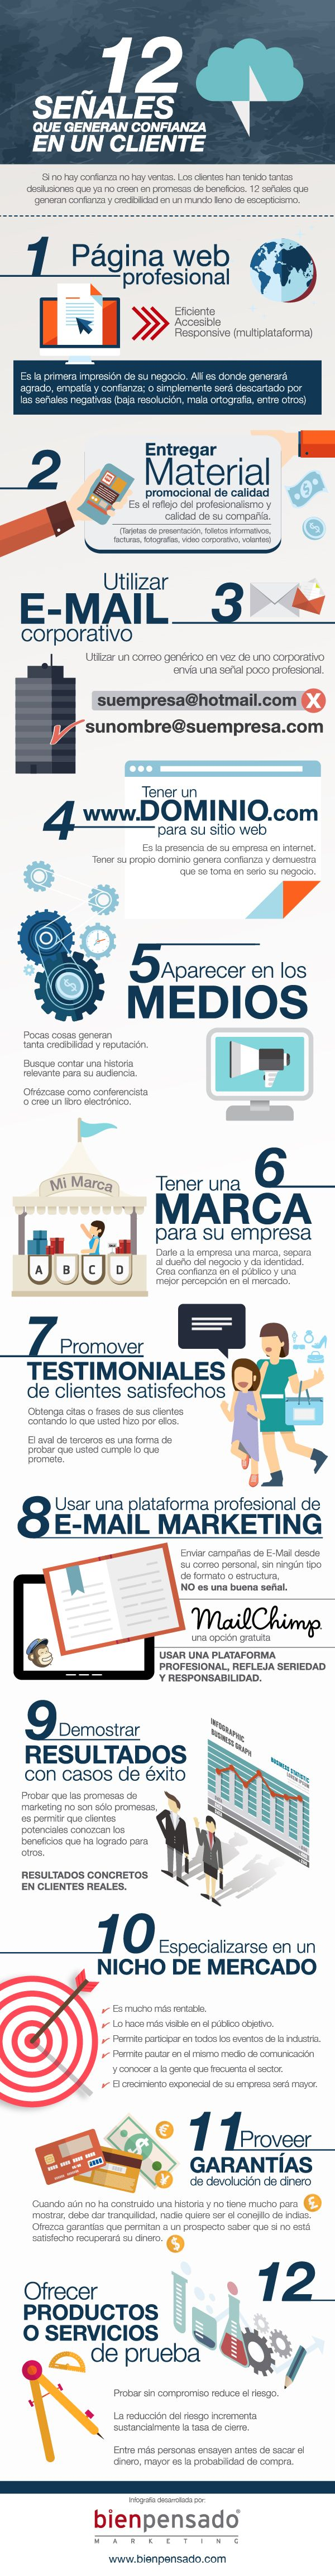 Infografía sobre Marketing.